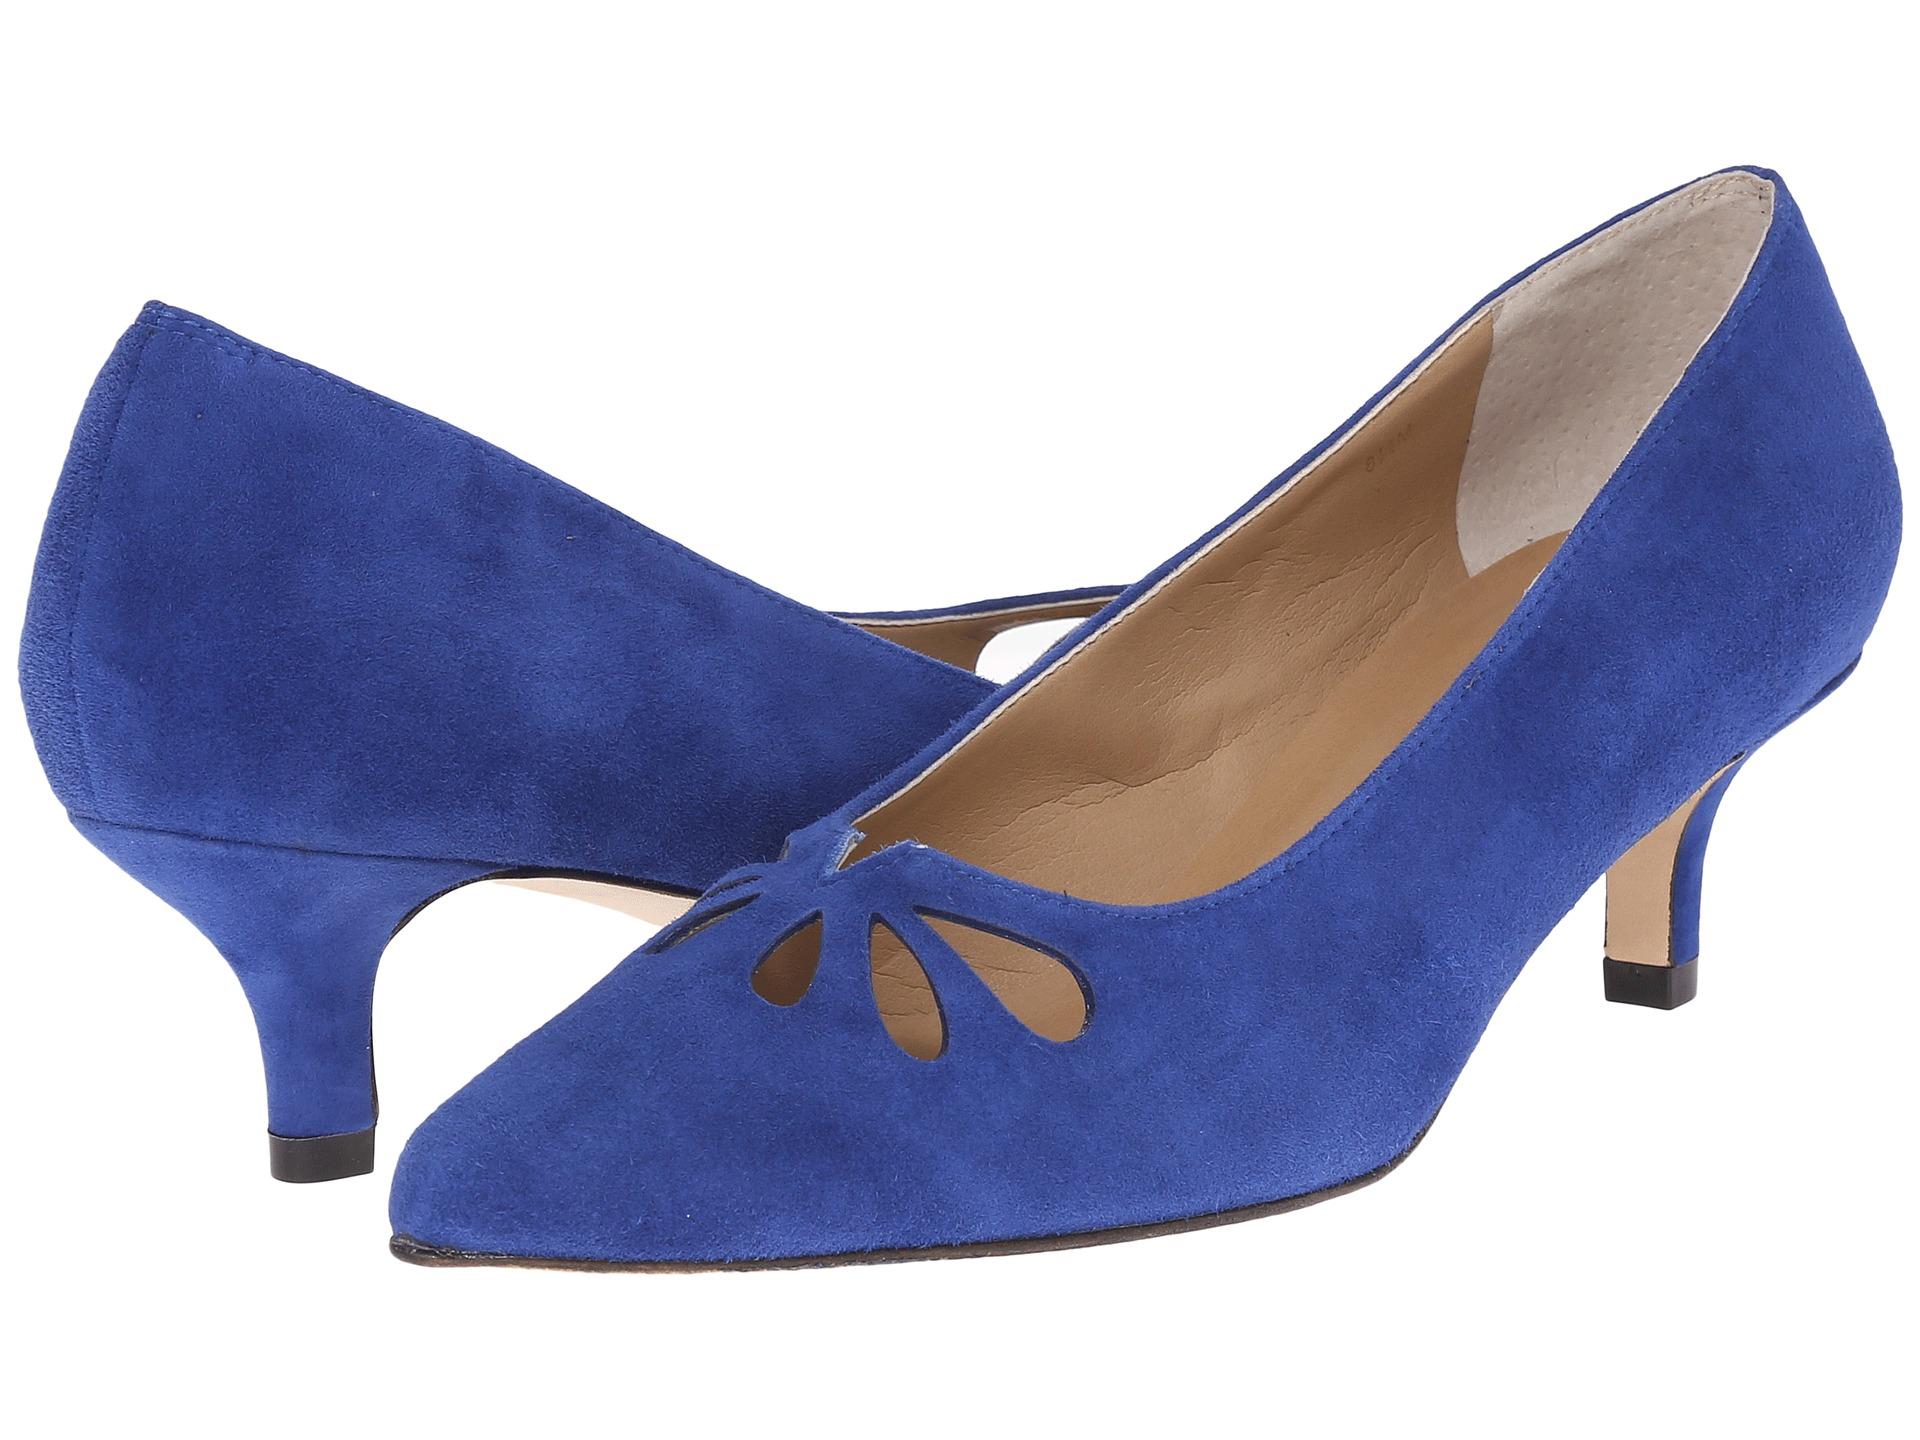 Womens Shoes Vaneli Tany Jordan Blue Suede